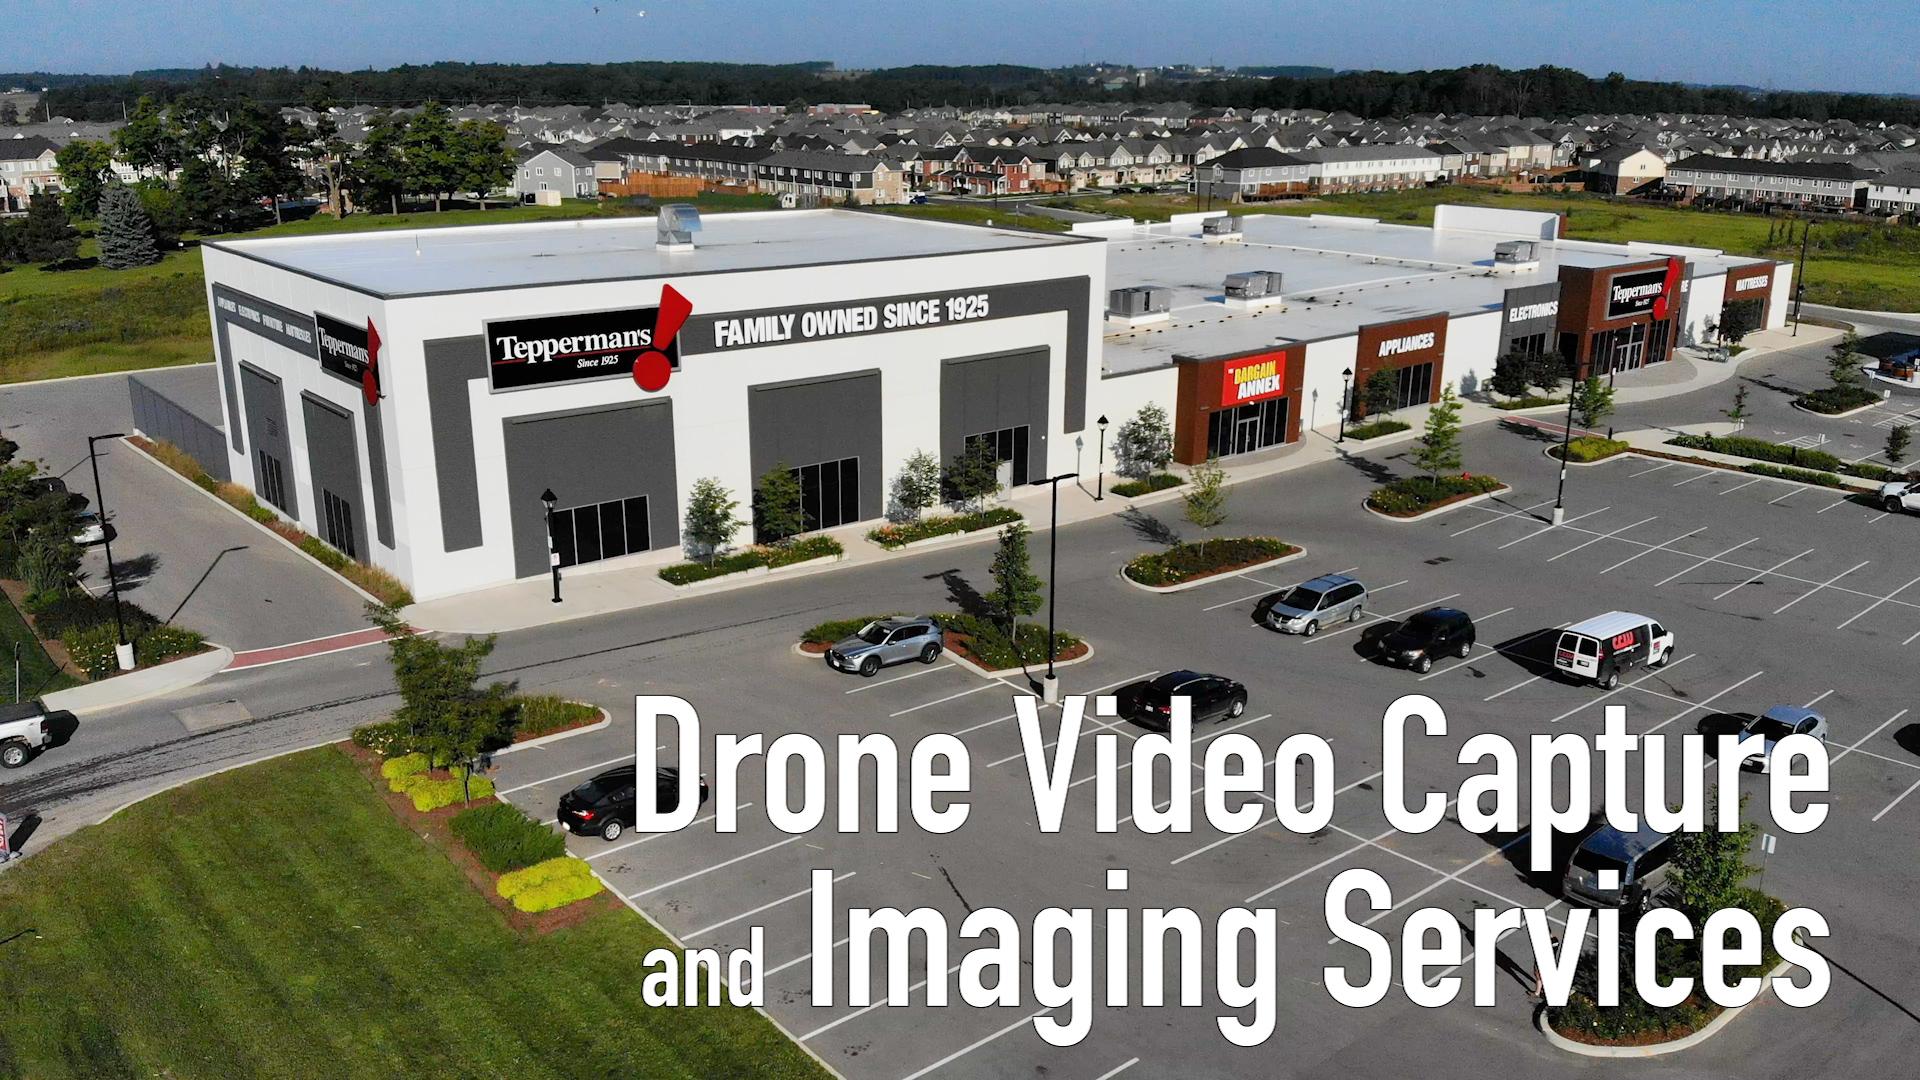 Hawkeye Films - Drone Footage for Kitchener, Waterloo, Cambridge, Toronto, Southern Ontario, Canada